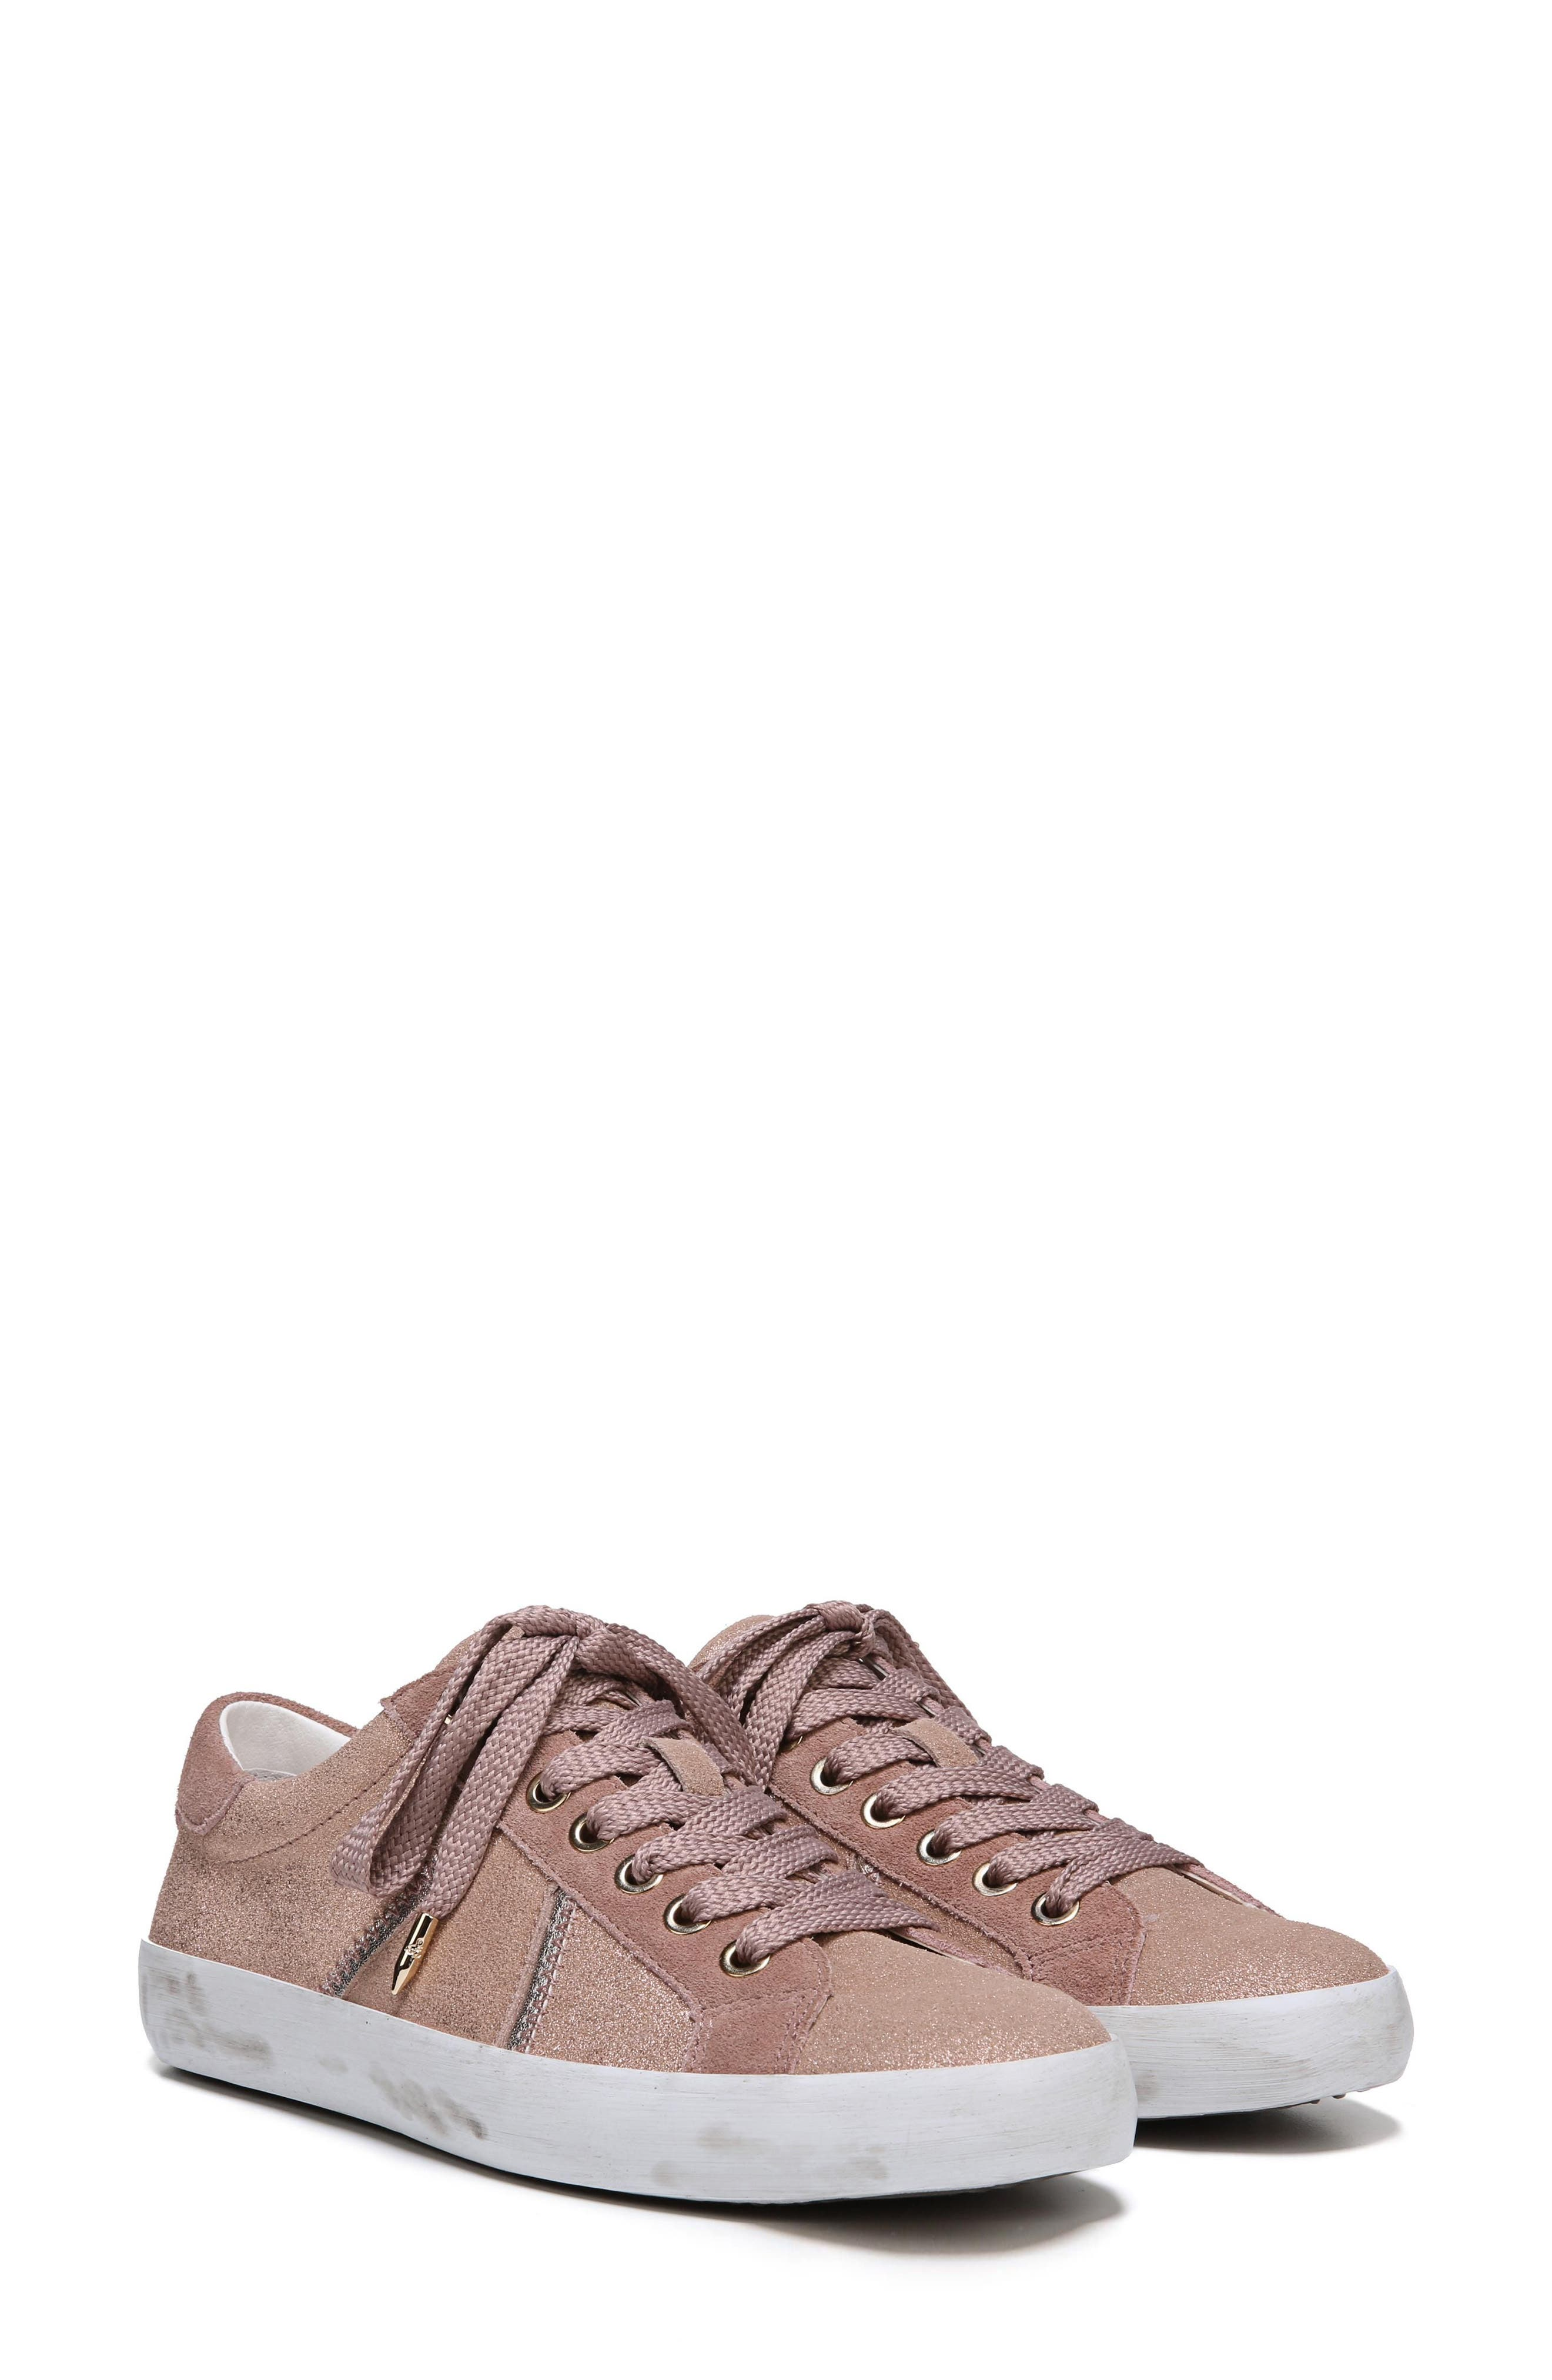 Baylee Sneaker,                             Alternate thumbnail 8, color,